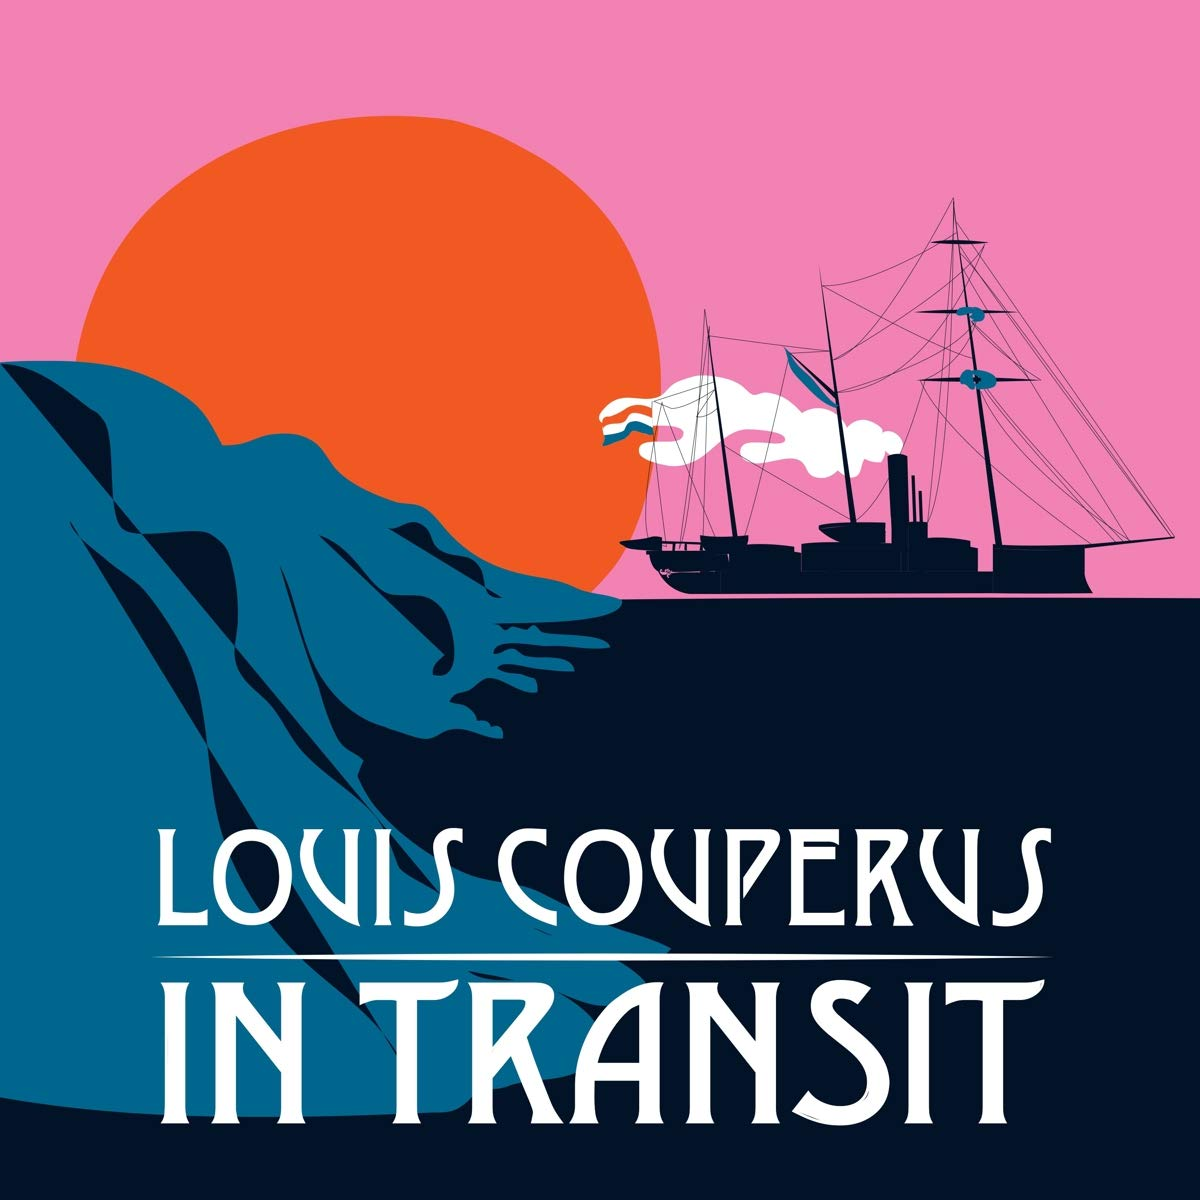 Louis Couperus In Transit artwork